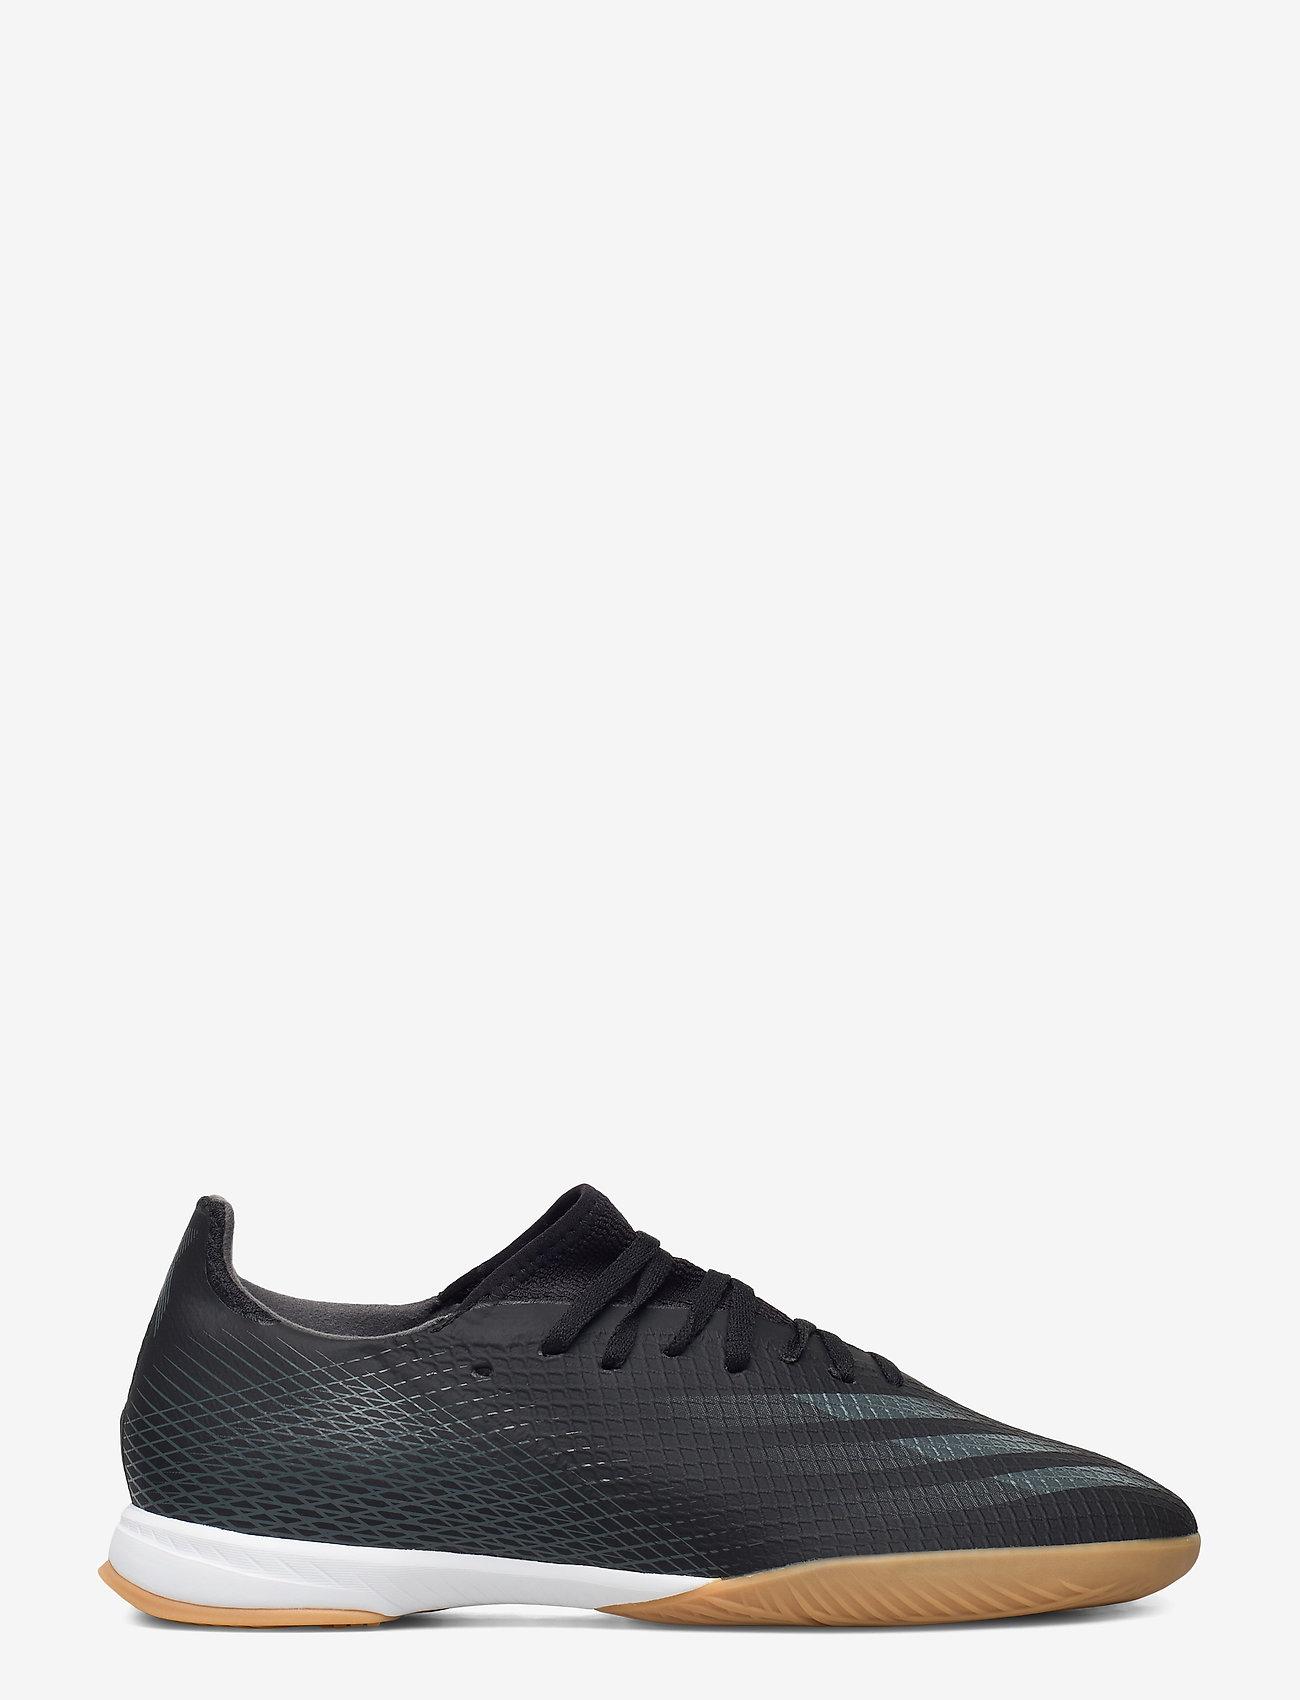 adidas Performance - X GHOSTED.3 IN - fodboldsko - cblack/gresix/cblack - 1